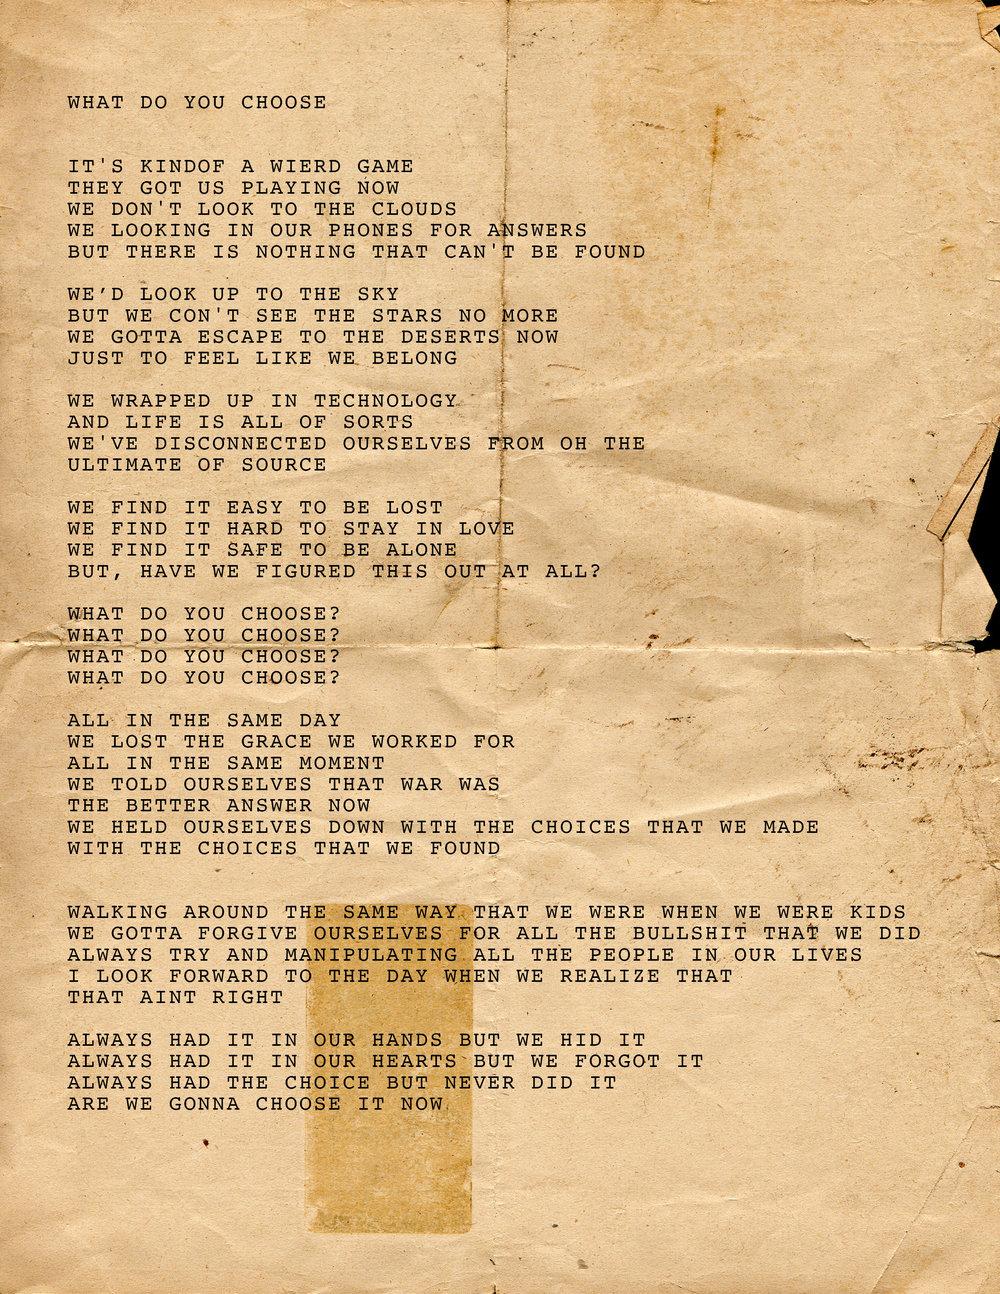 8 What Do You Choose Lyrics.jpg